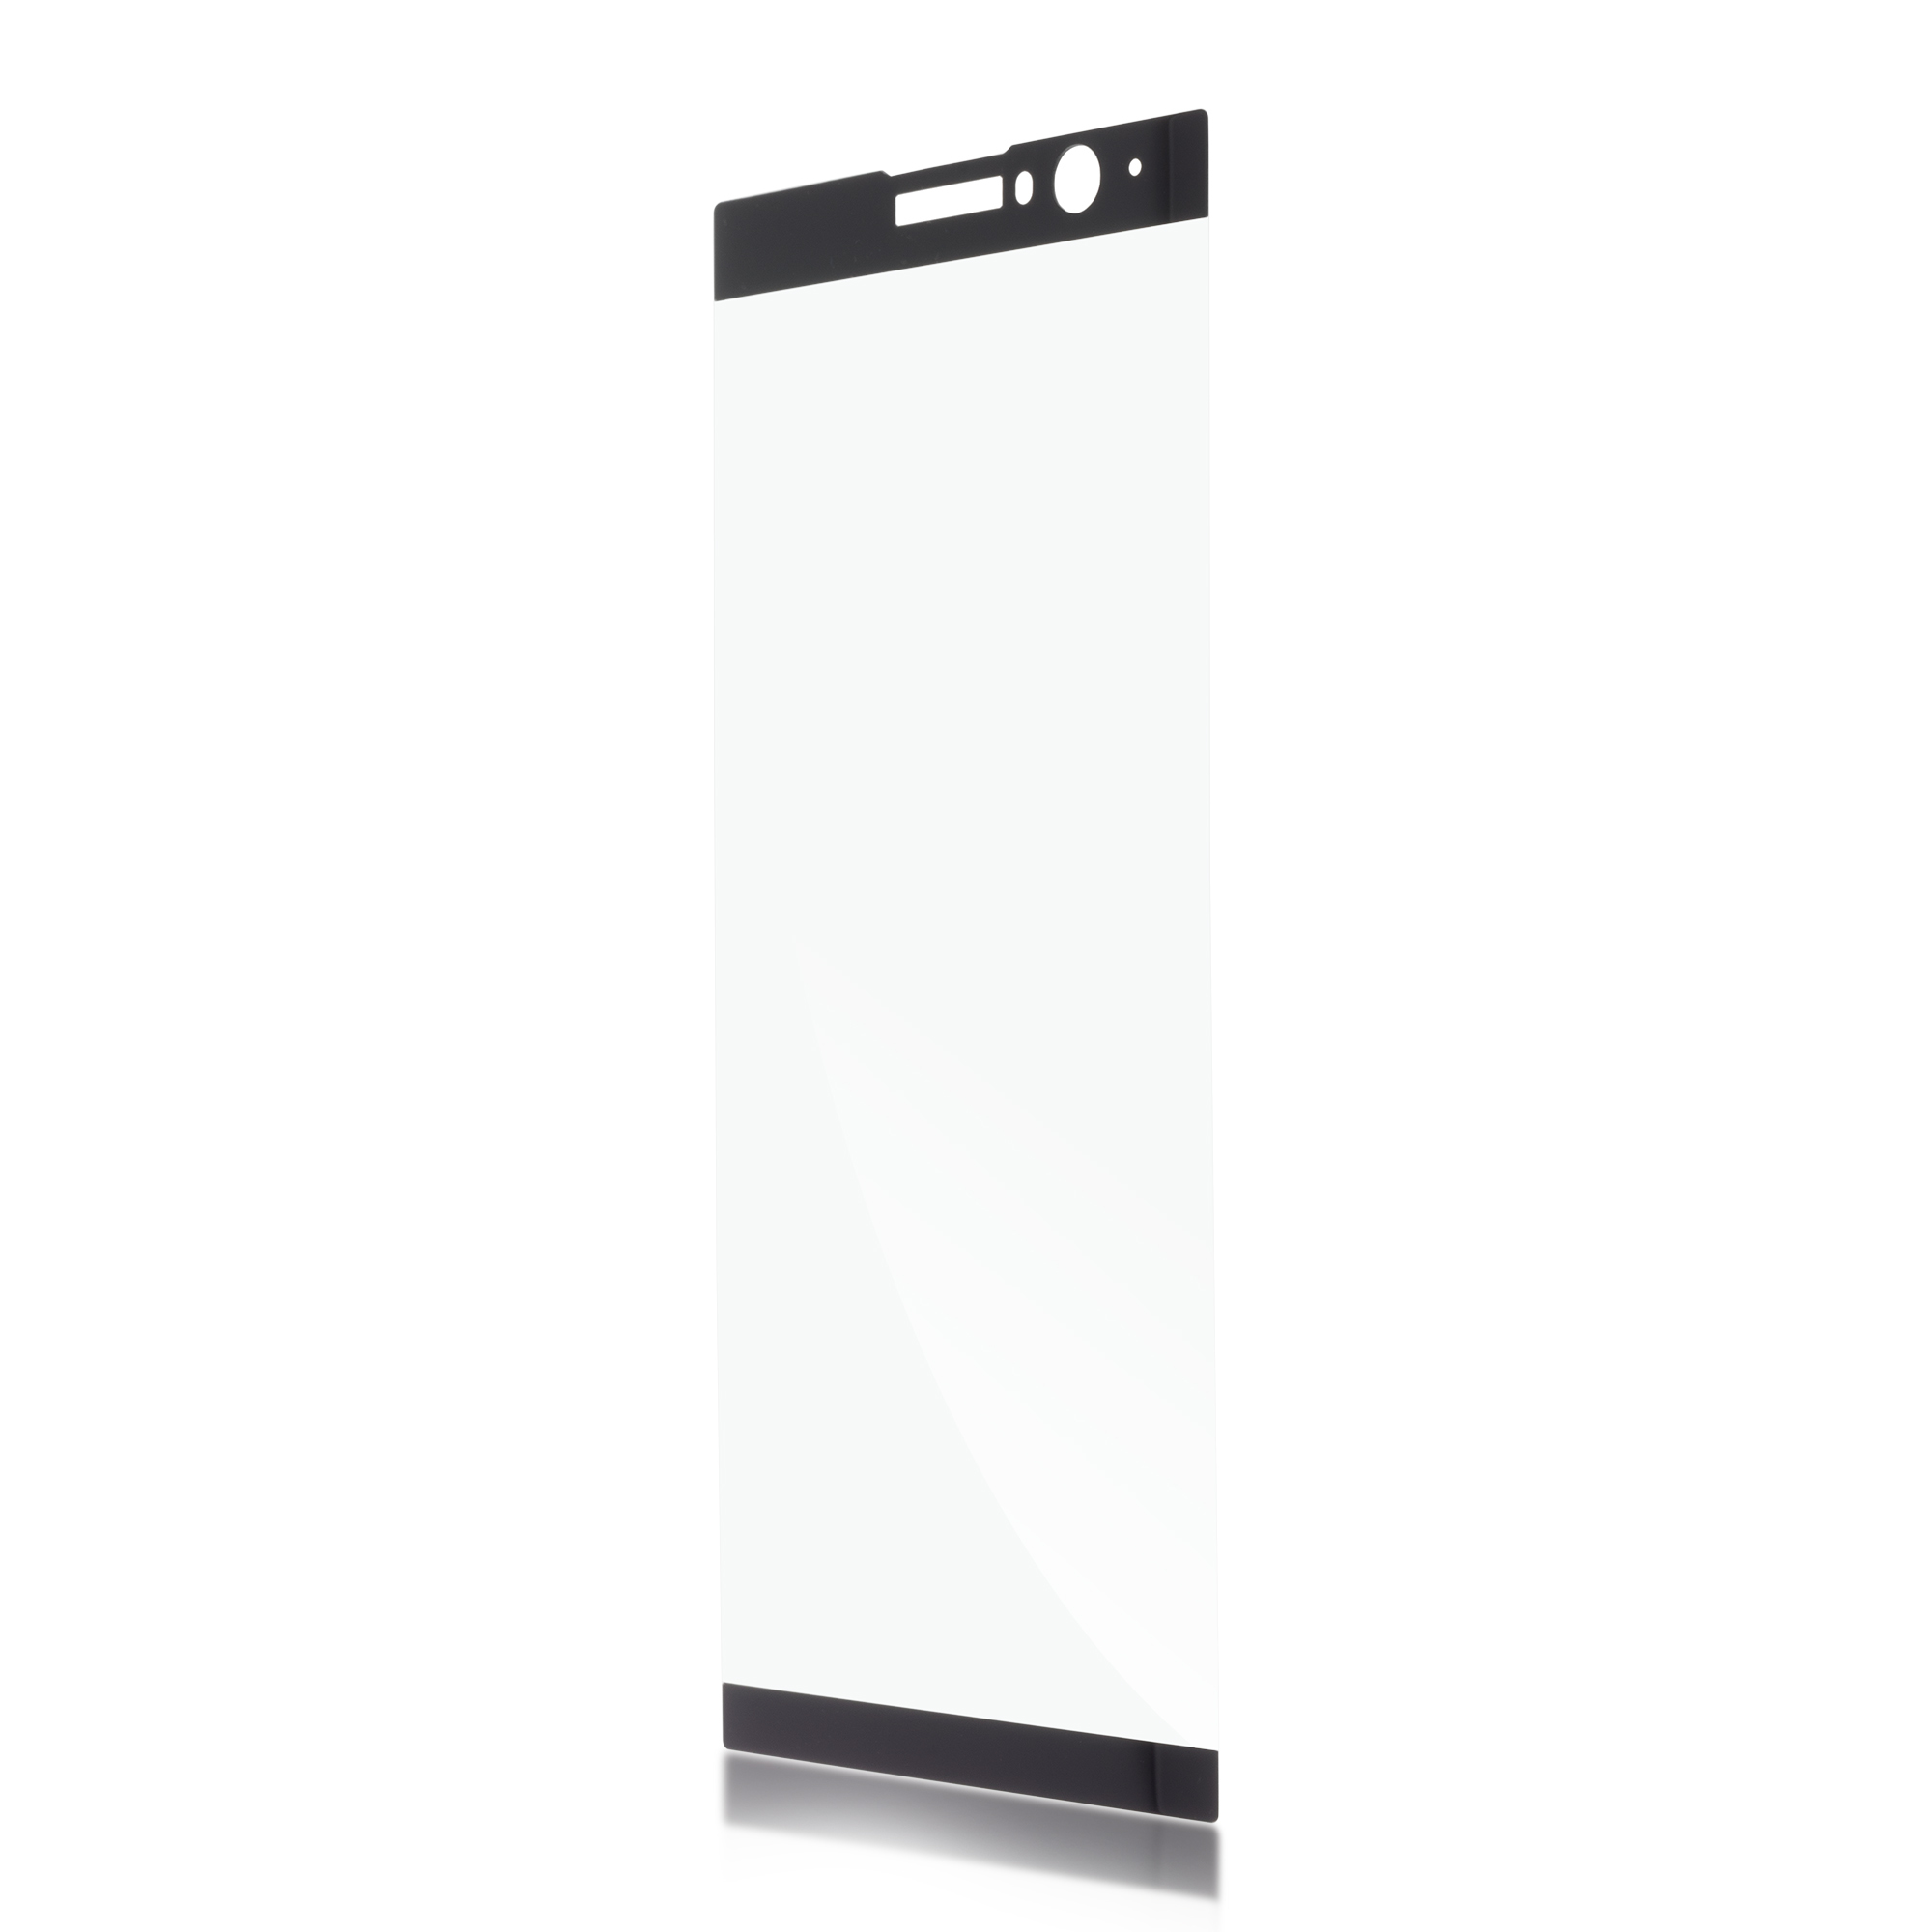 Защитное стекло для Xperia XA2 Plus чёрного цвета